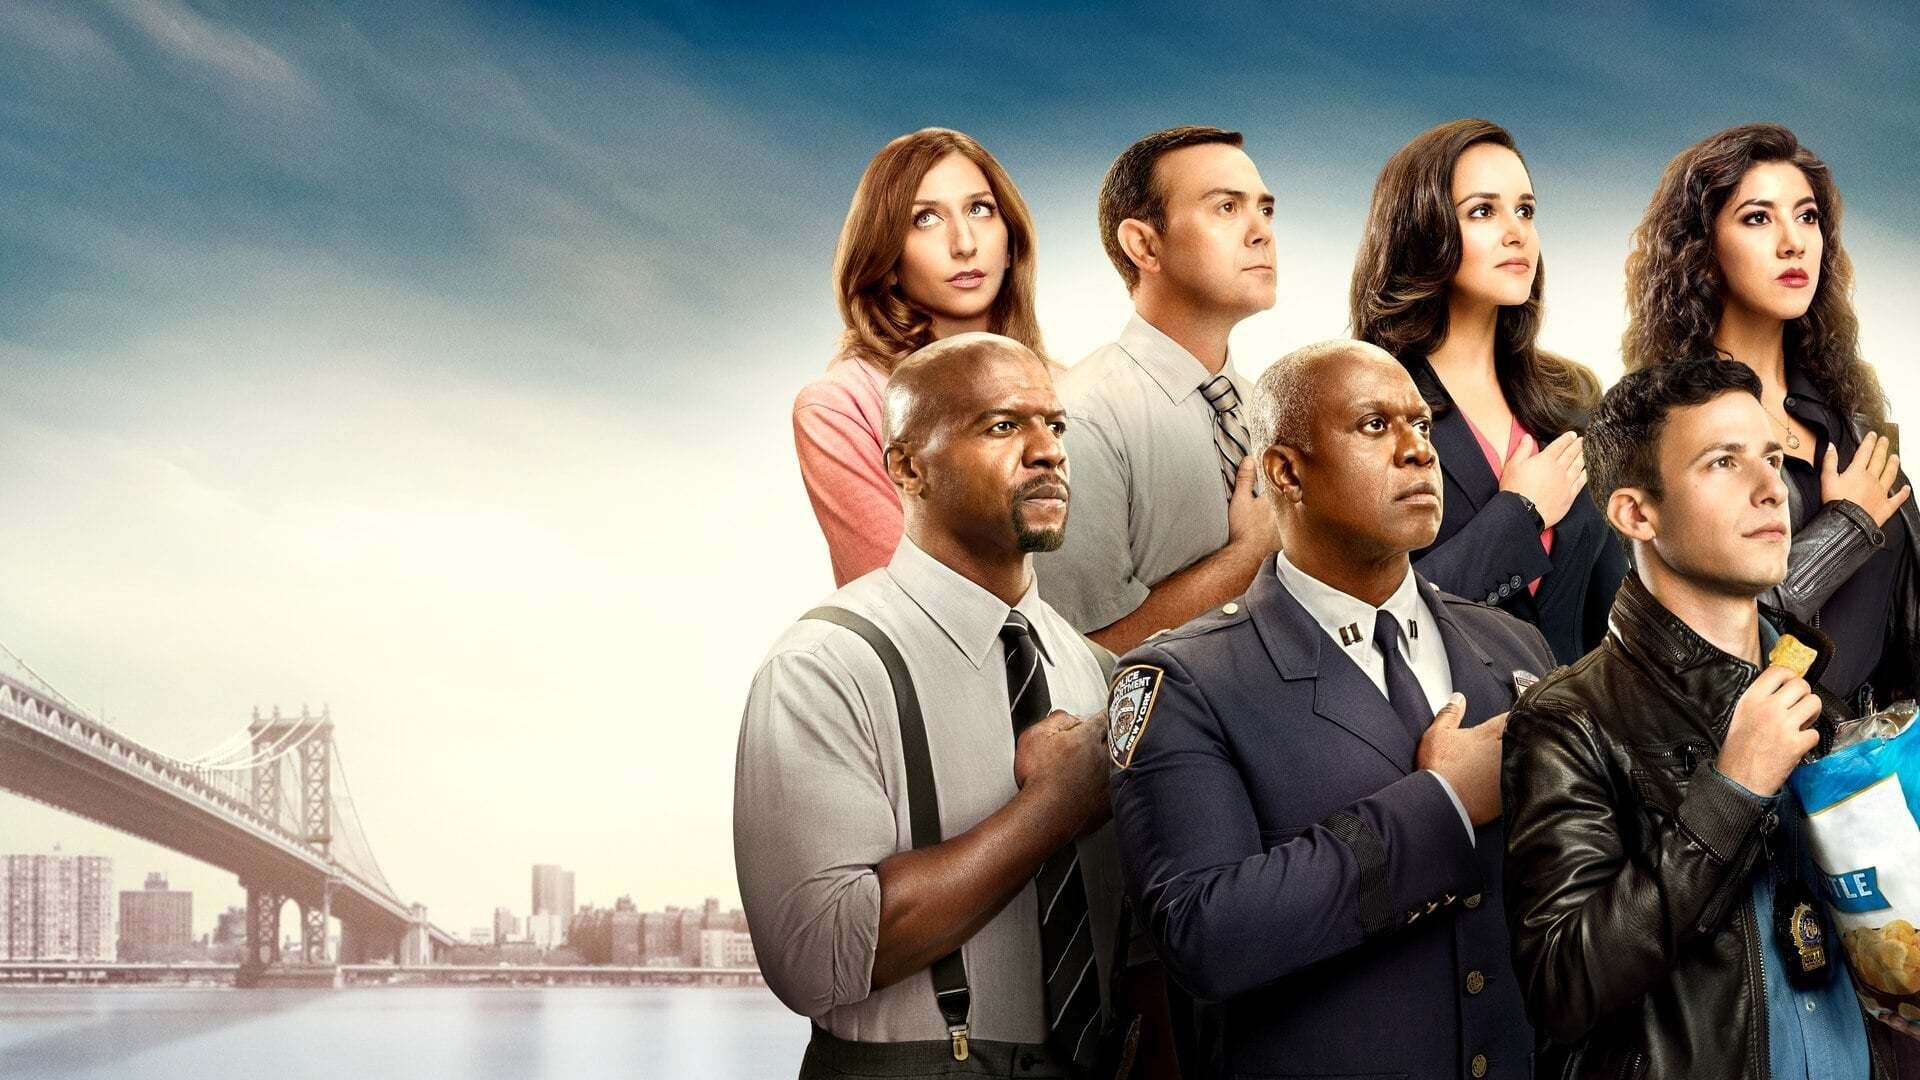 Кадры из фильма Бруклин 9-9 Brooklyn Nine-Nine 2013